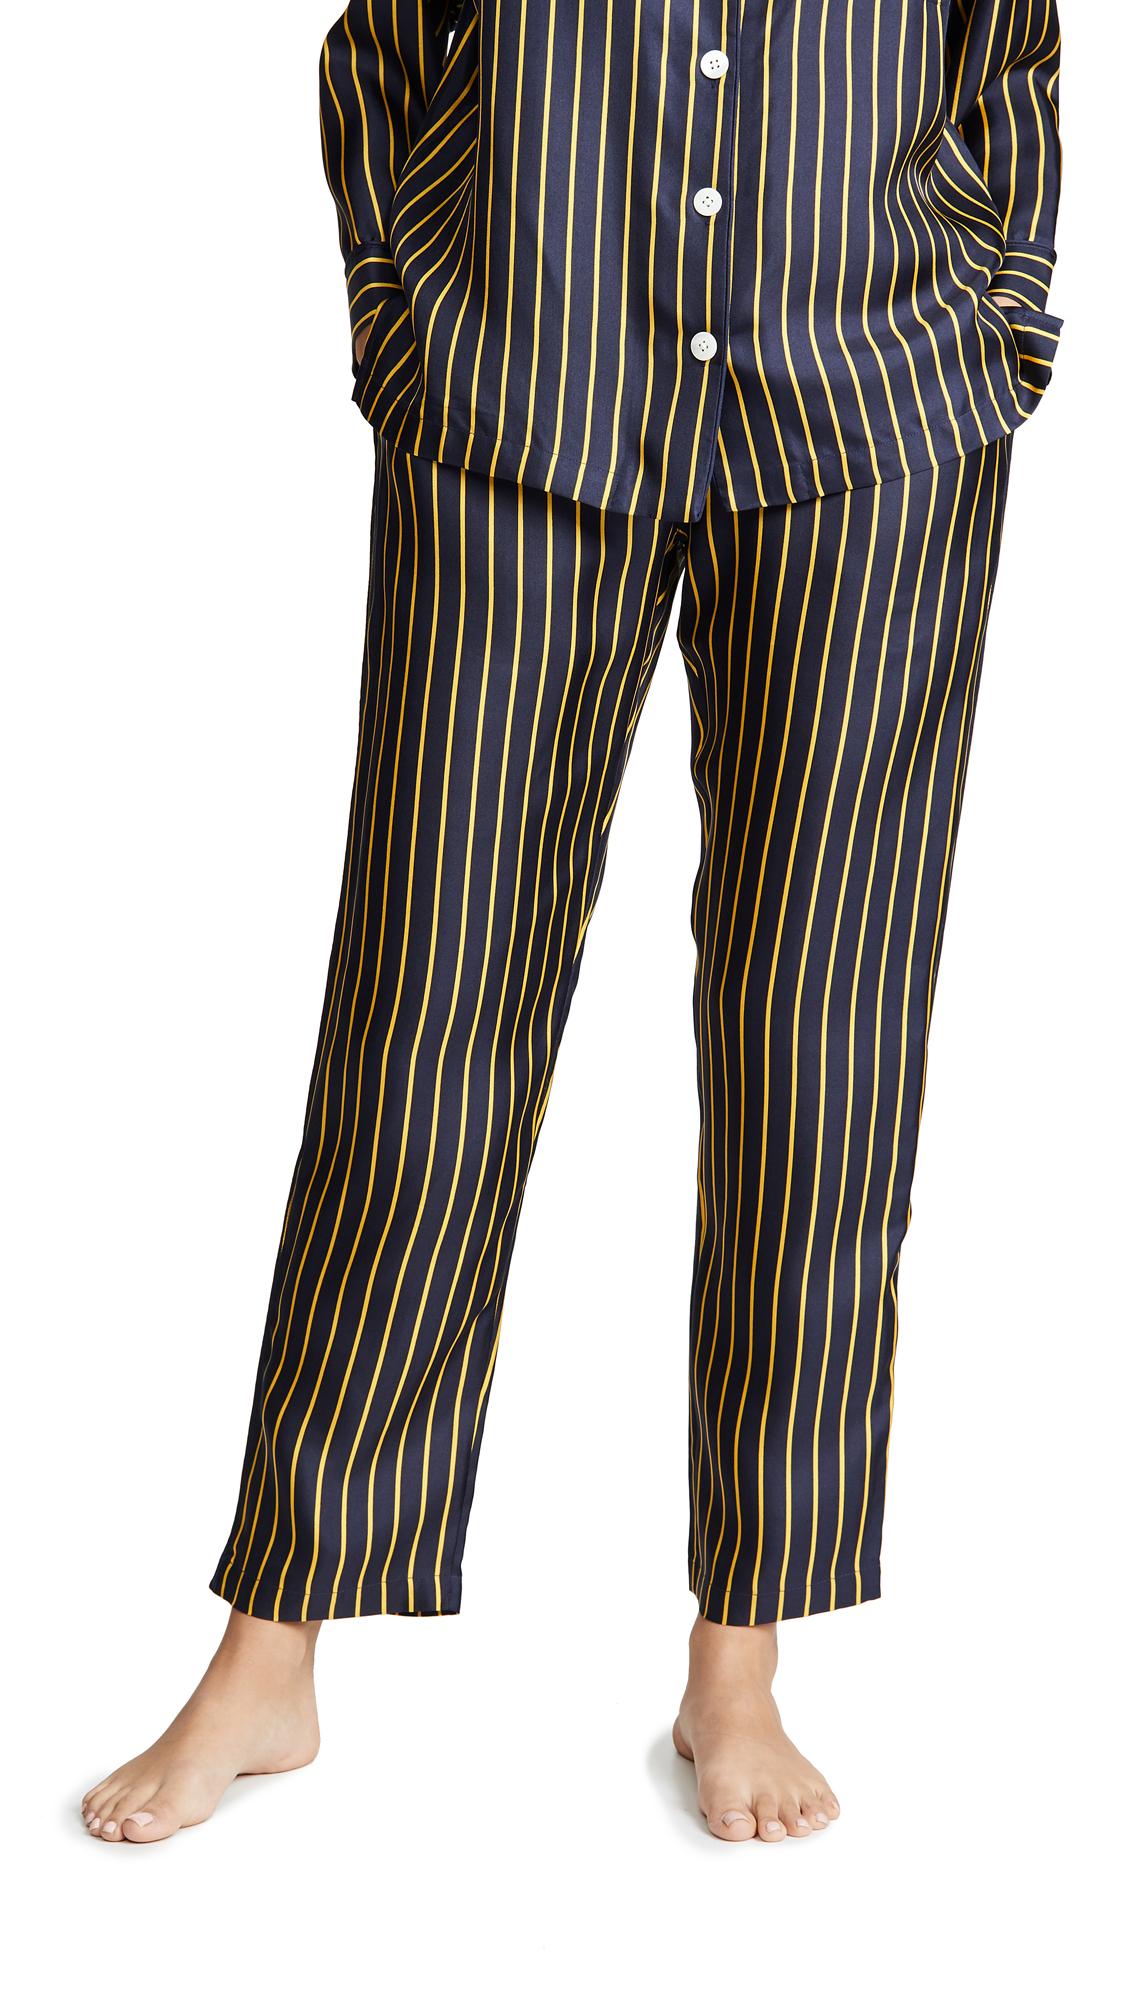 Sleepy Jones Marina Pajama Pants In Silk Tie Stripe Navy & Gold